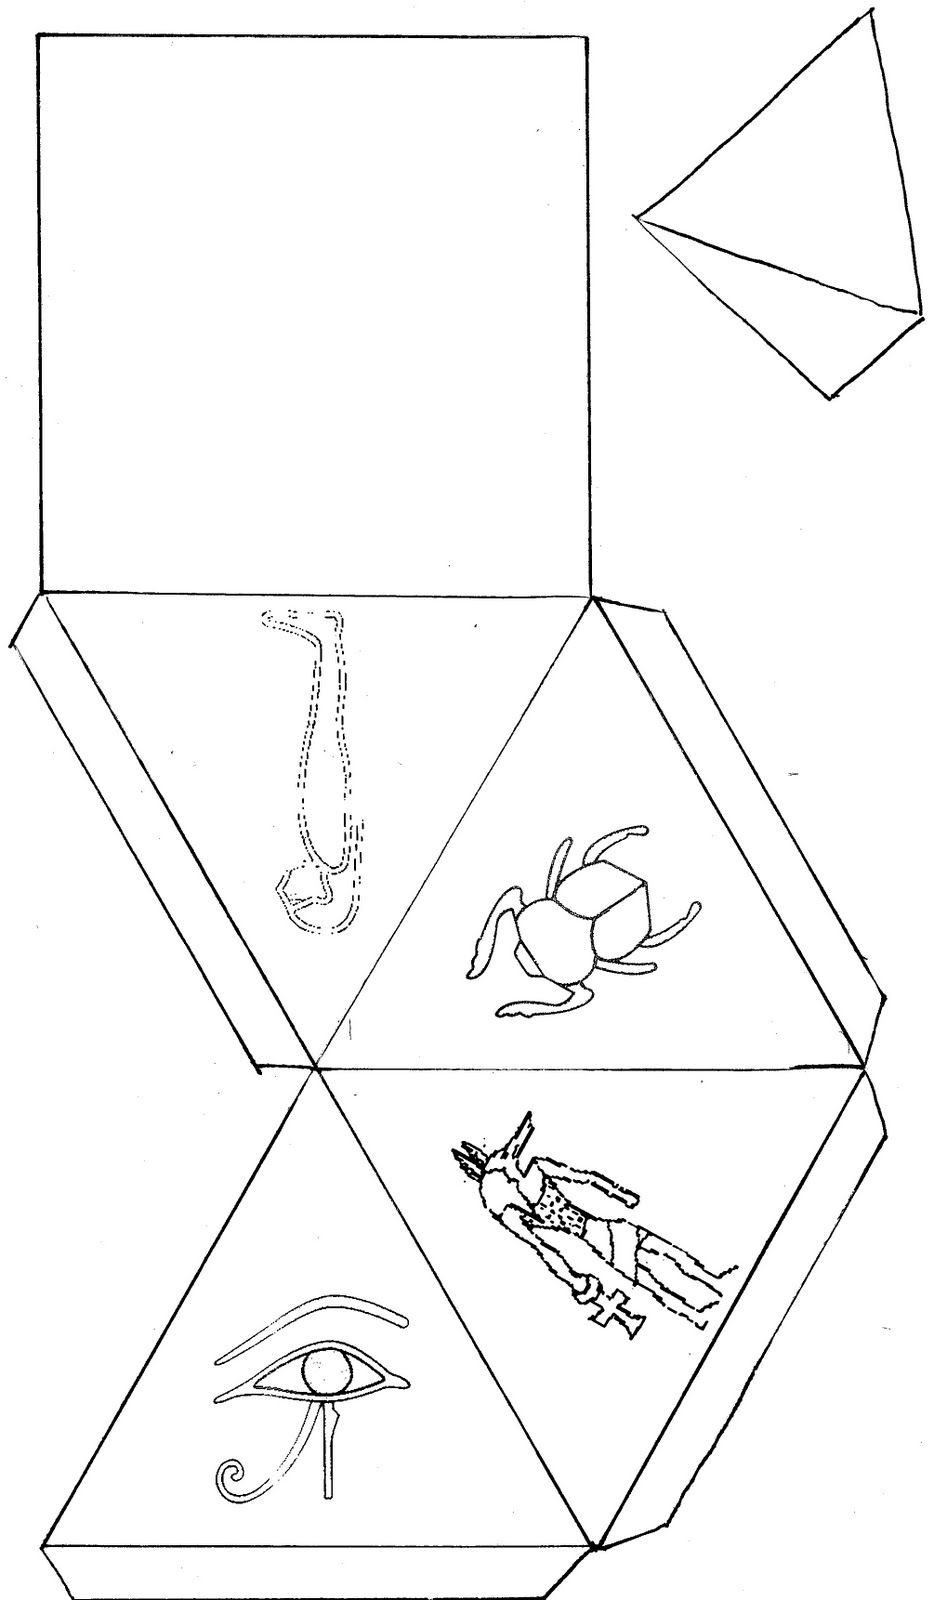 Piramide Plantilla Piramides De Egipto Piramides Egipcias Piramides De Egipto Dibujo